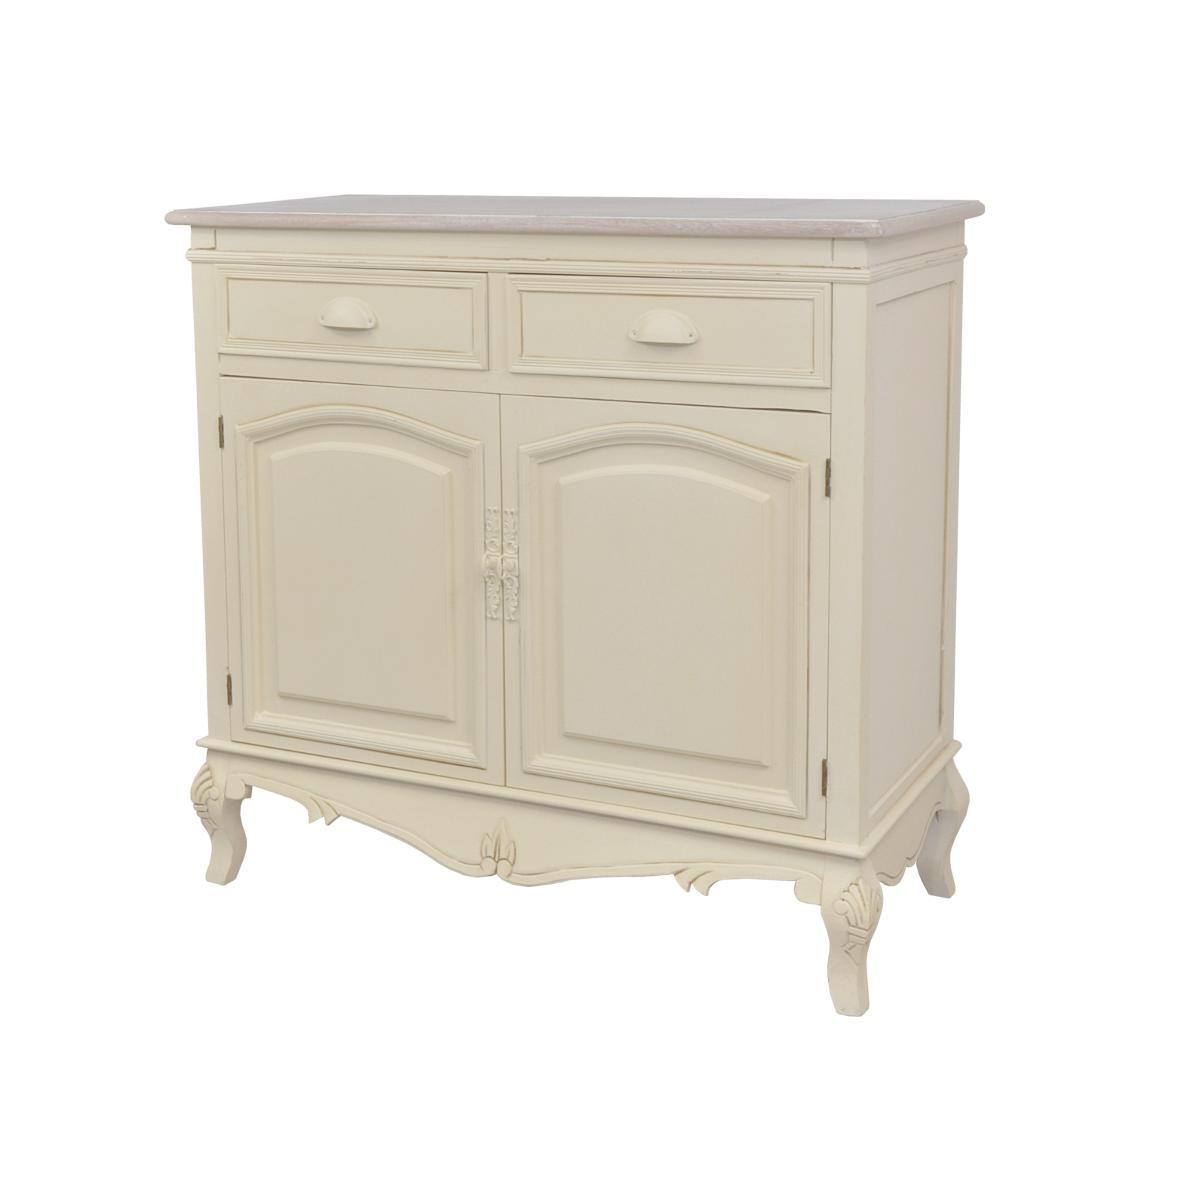 Cabinet din lemn de plop si MDF, cu 2 sertare si 2 usi Rimini RI01D Cream / Light Brown , l90xA39xH85 cm imagine